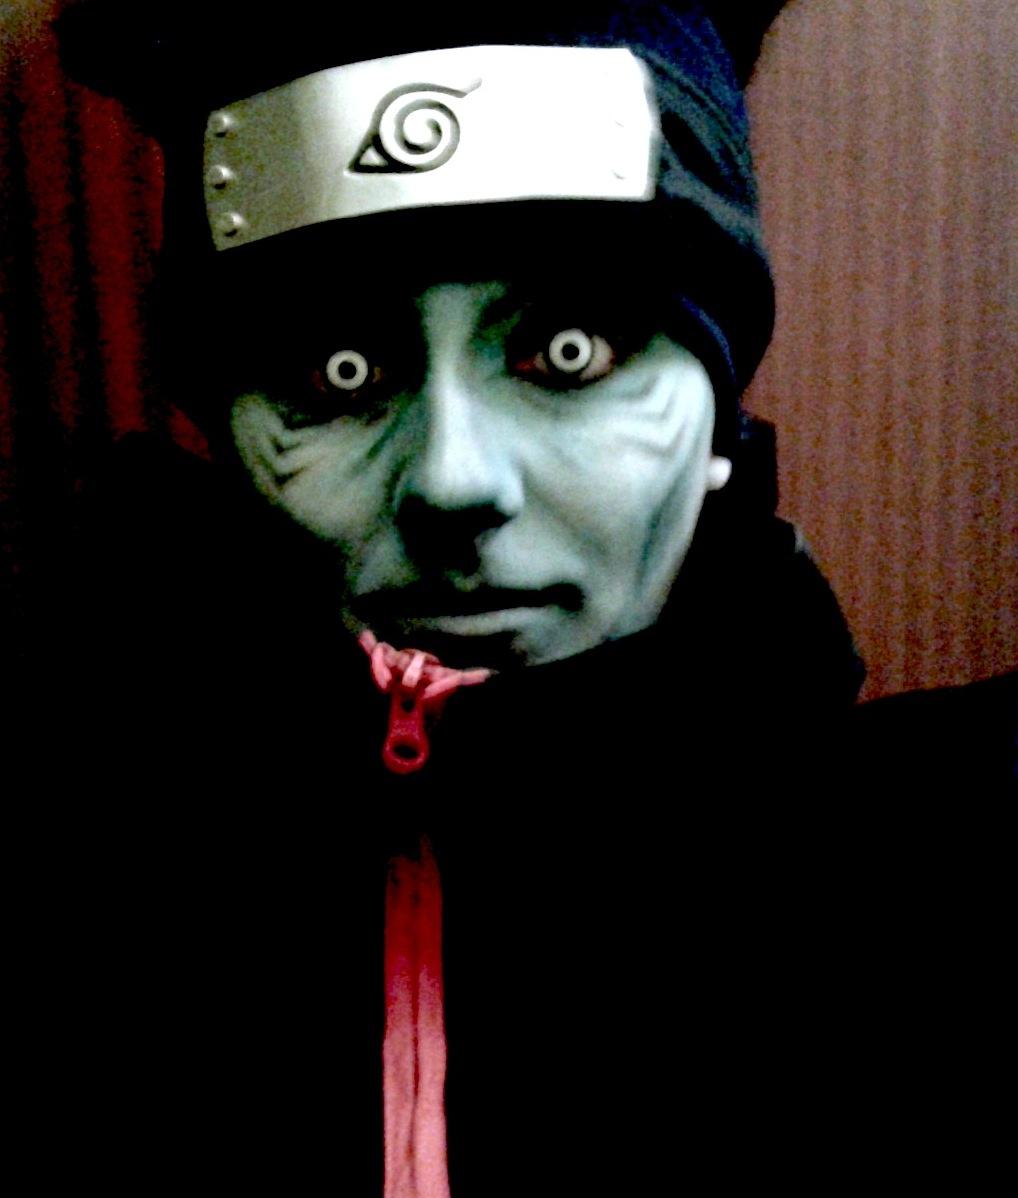 http://fc05.deviantart.net/fs70/f/2013/027/6/0/kisame_cosplay_5_by_2034220p4rd1-d5syaty.jpg